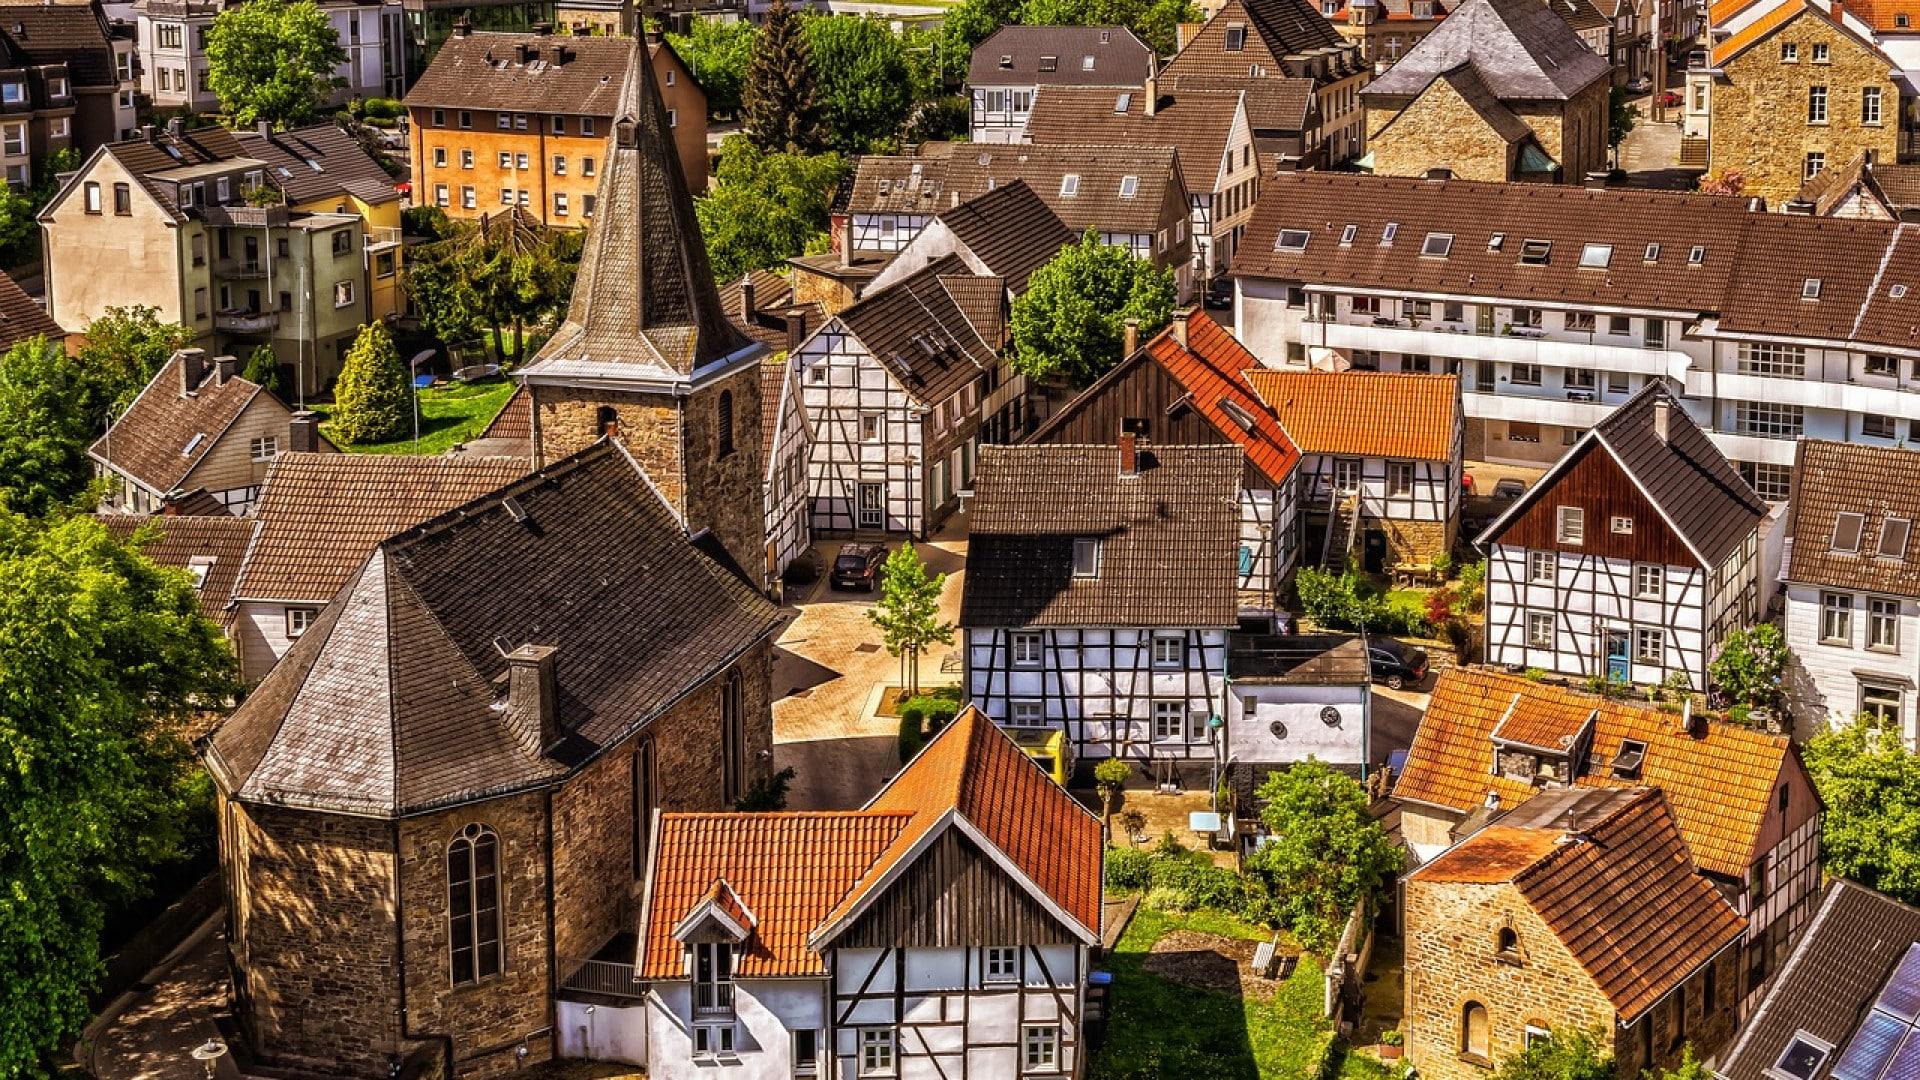 Investissement immobilier locatif ancien via la loi Malraux : les avantages